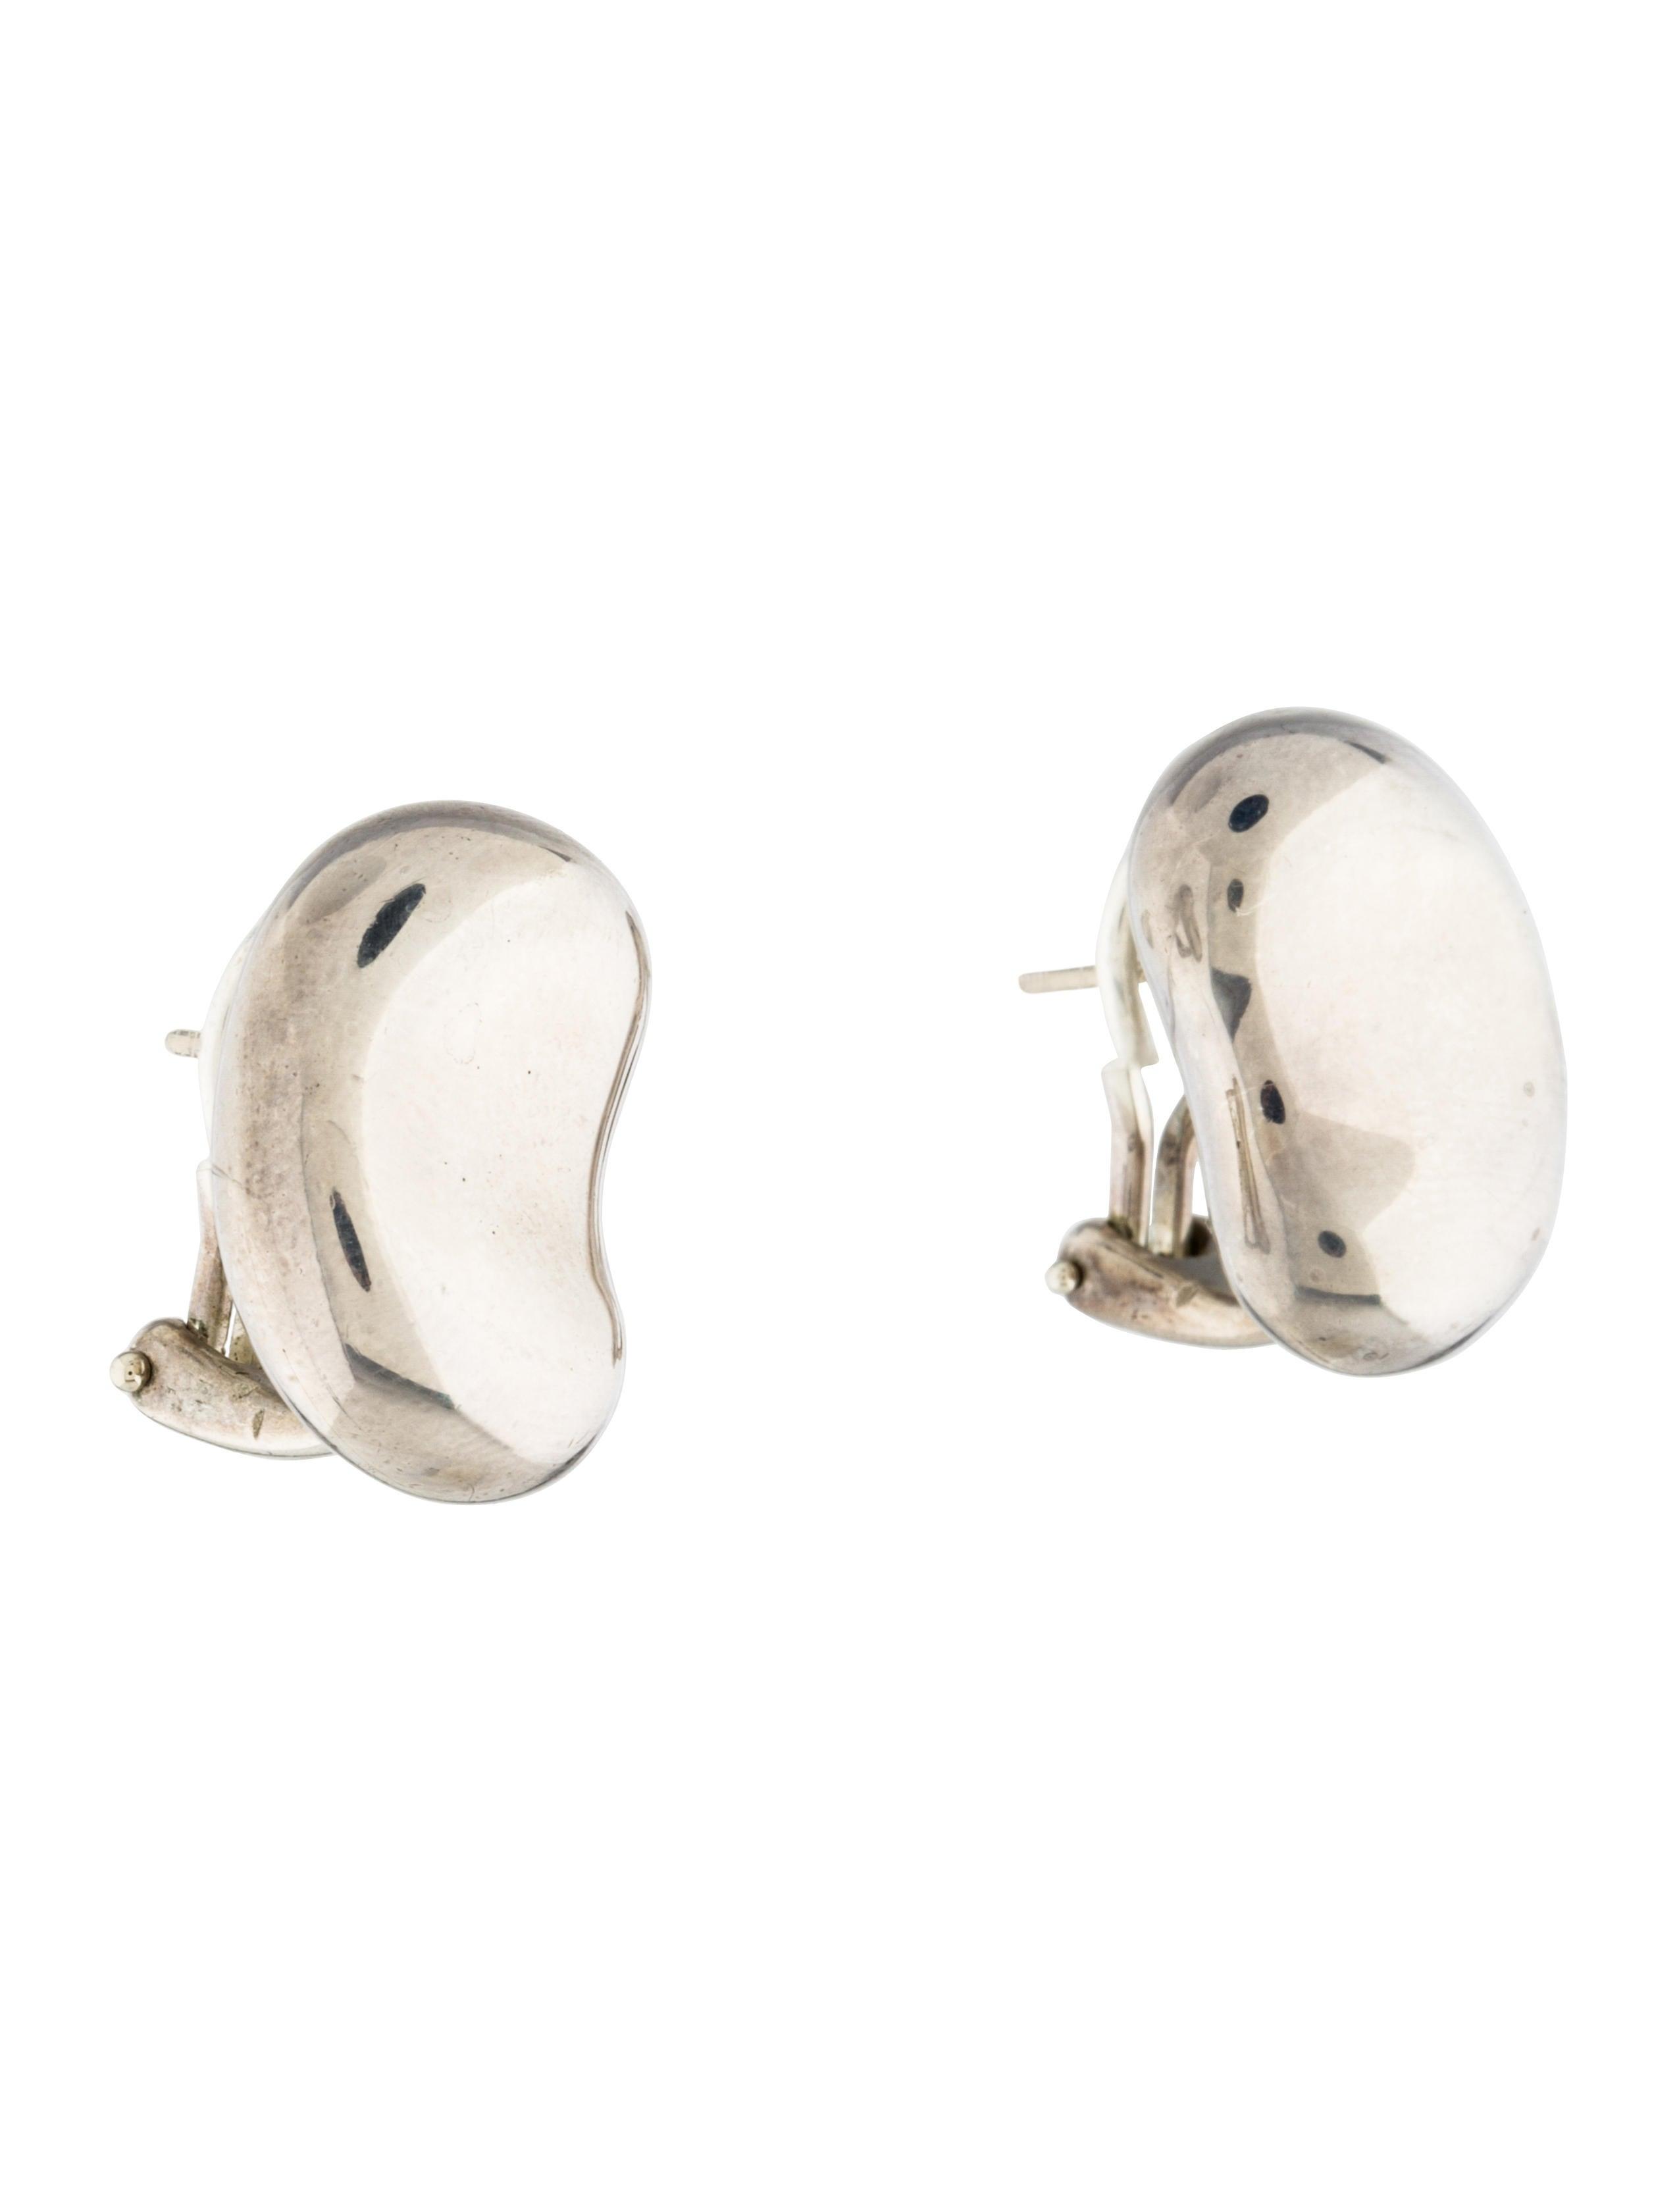 Bean Earrings